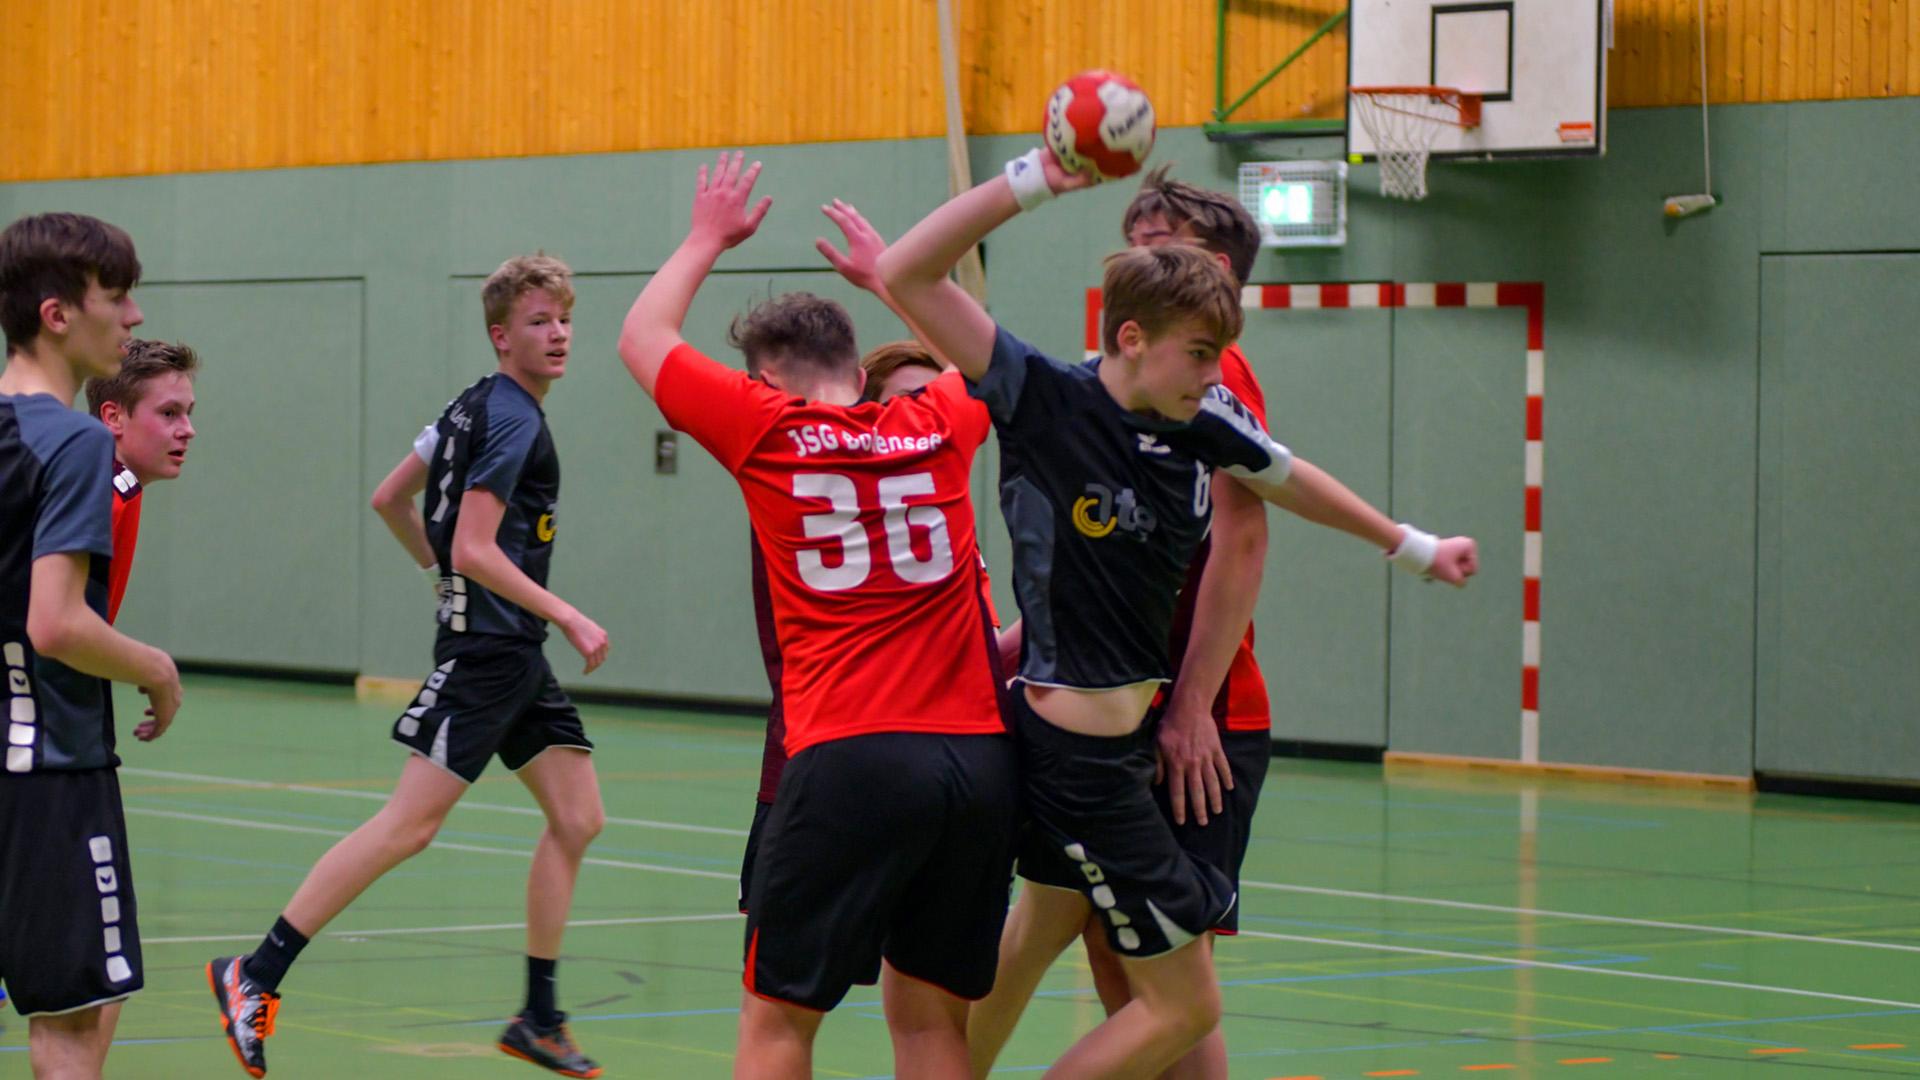 080Slider_mA_tsg_leutkirch_handball